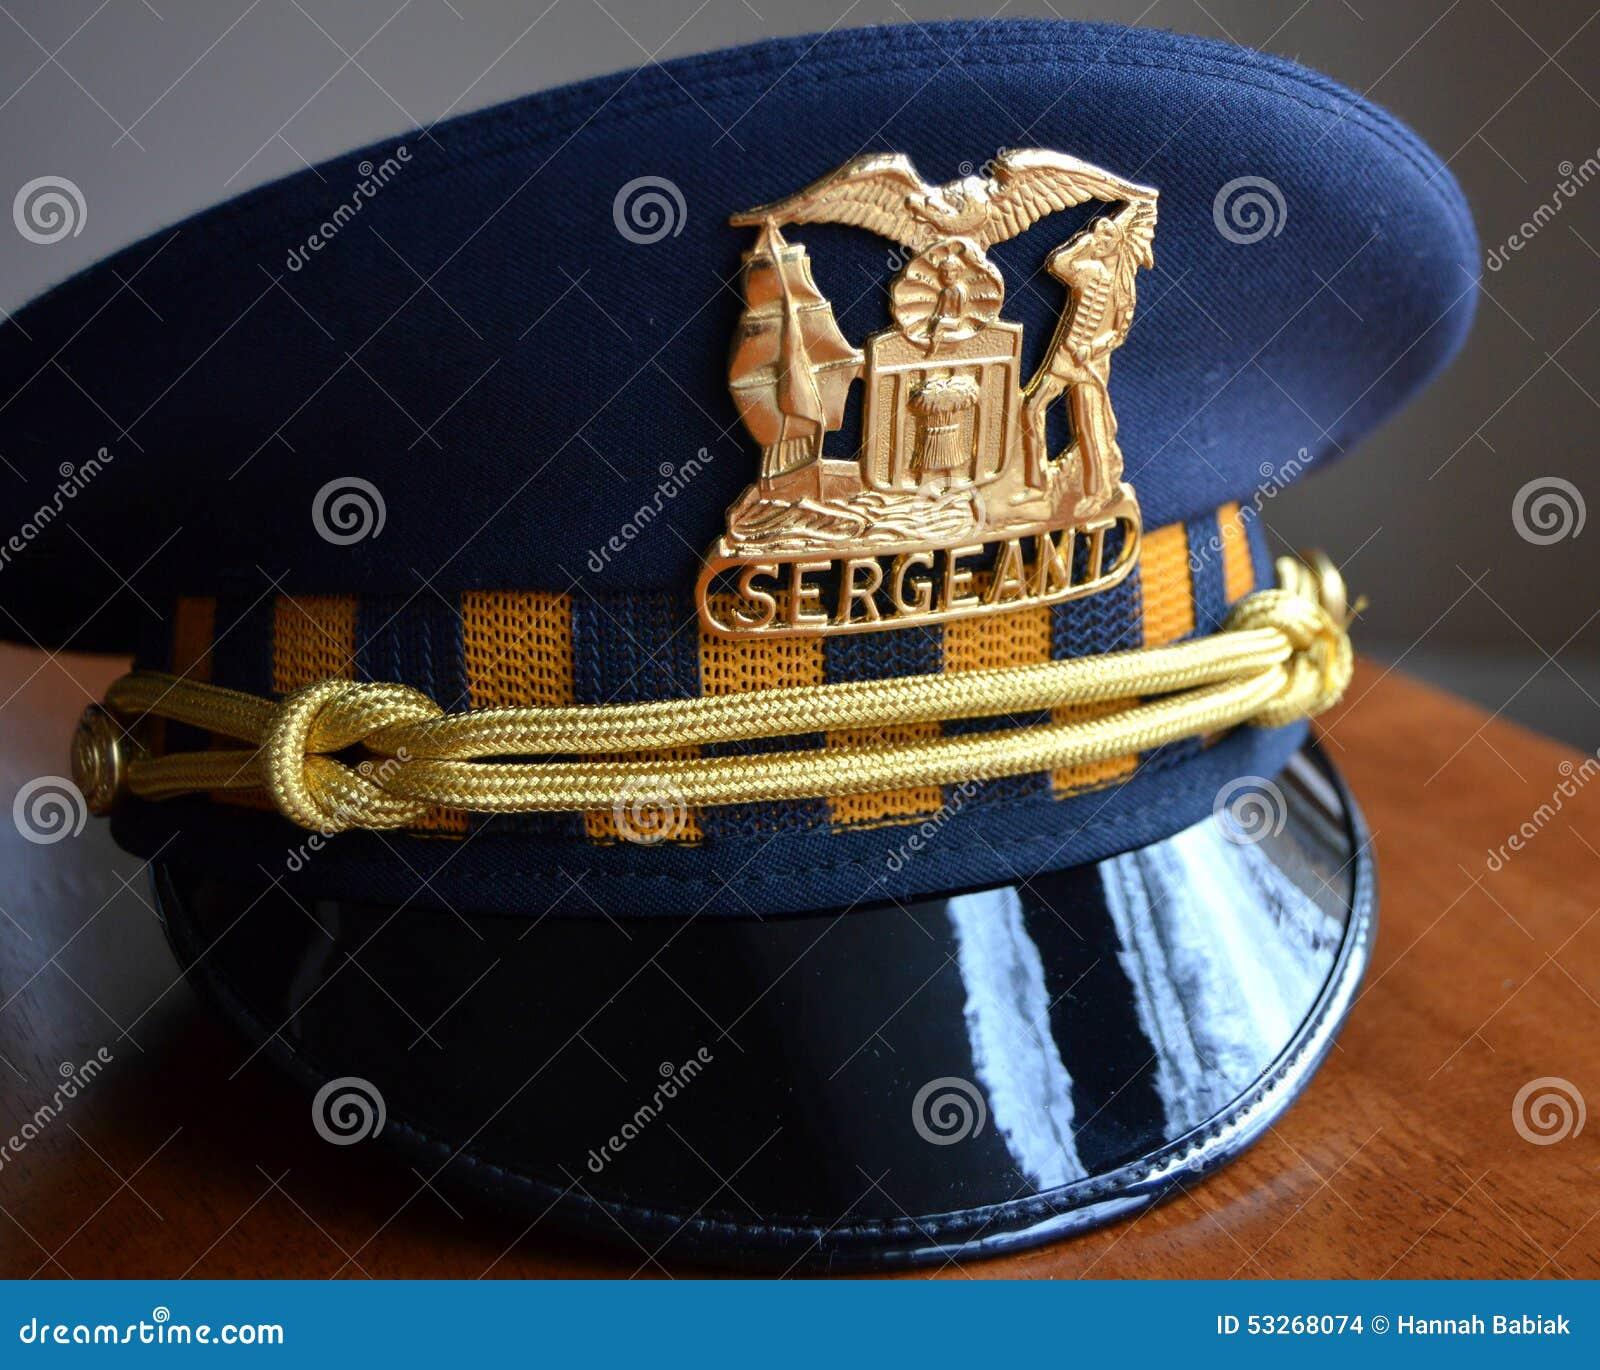 Sergeant Police Hat Stock Photo Image 53268074